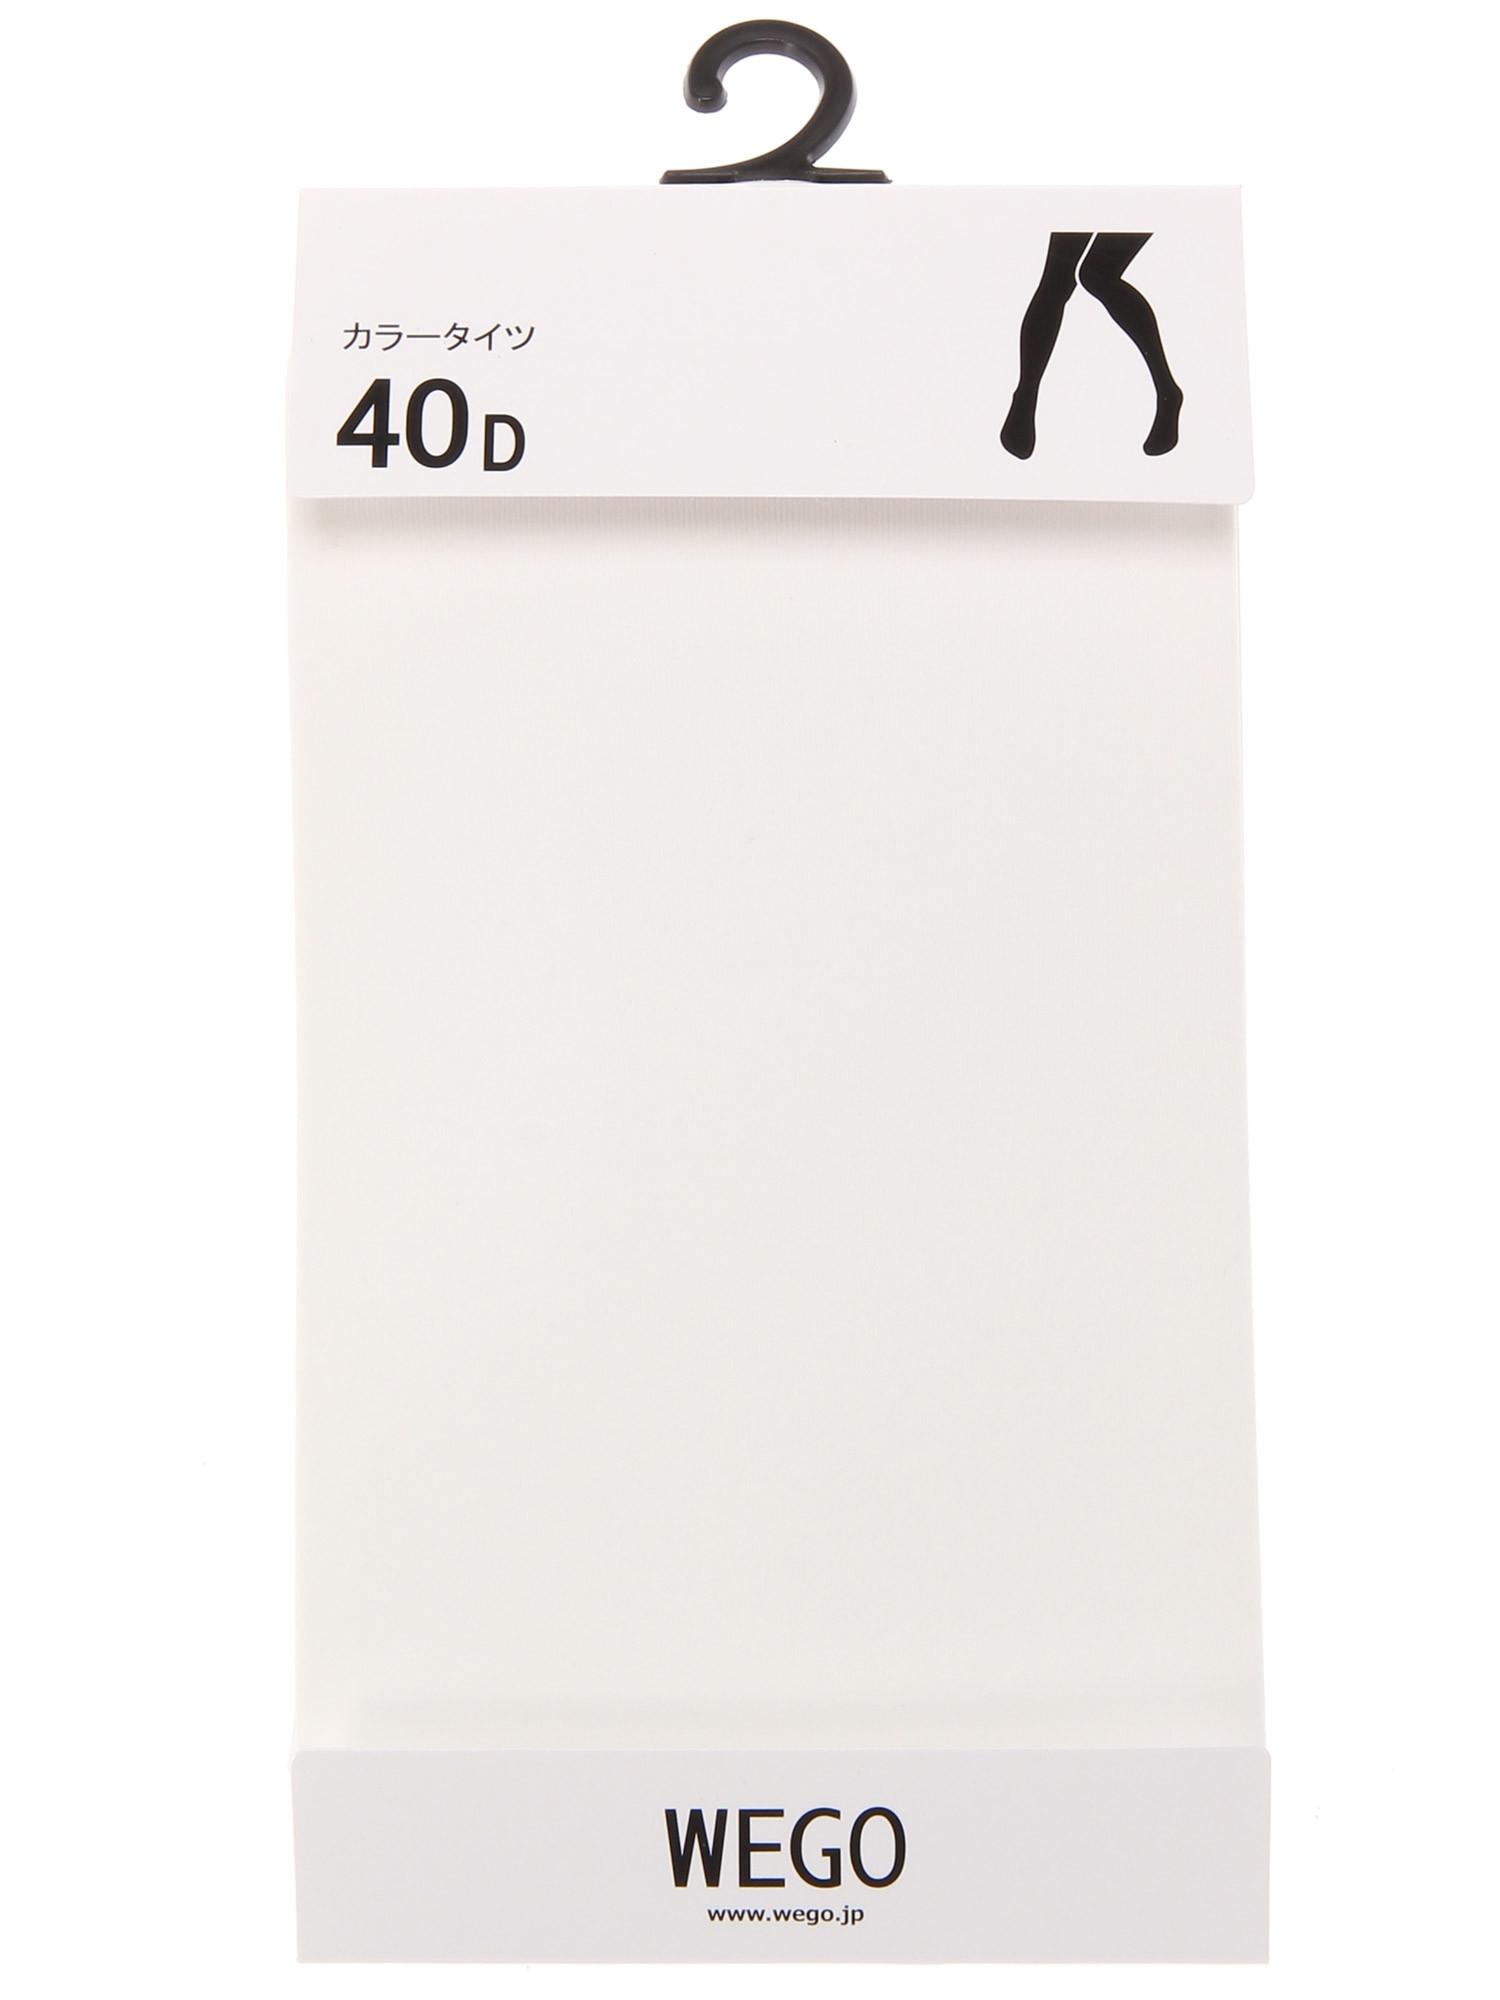 WEGO/40デニールタイツ